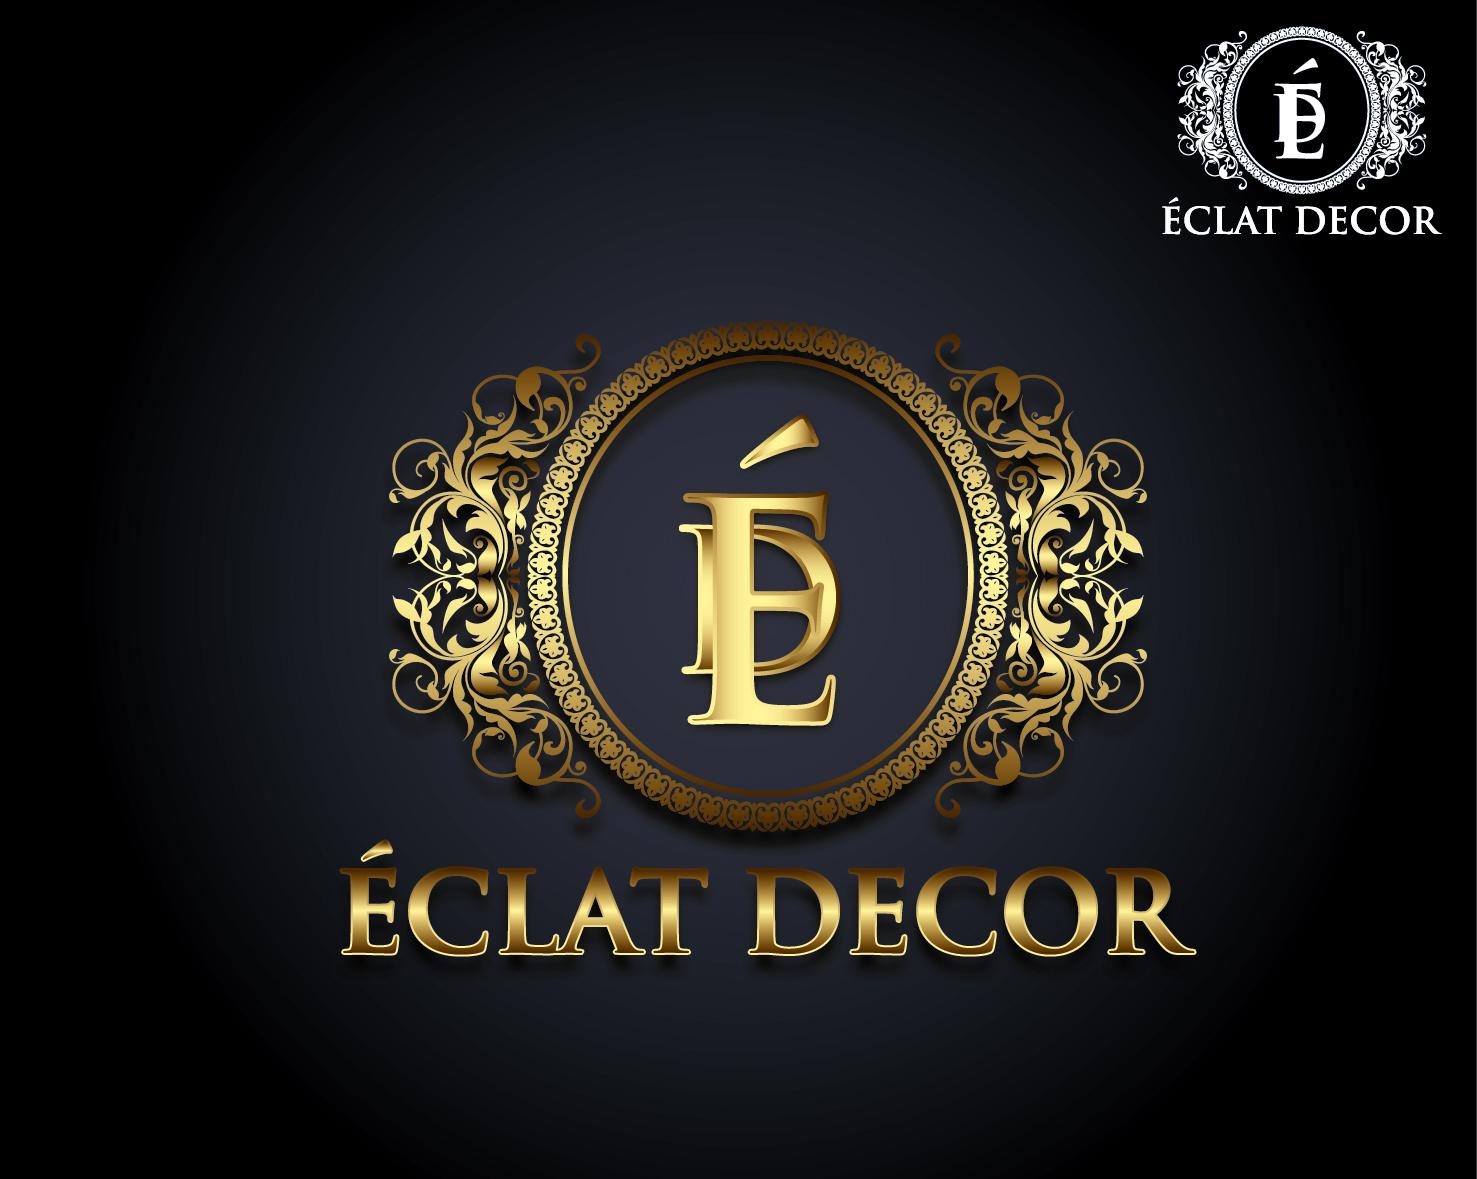 Logo Design by VENTSISLAV KOVACHEV - Entry No. 41 in the Logo Design Contest Imaginative Logo Design for Éclat Decor.